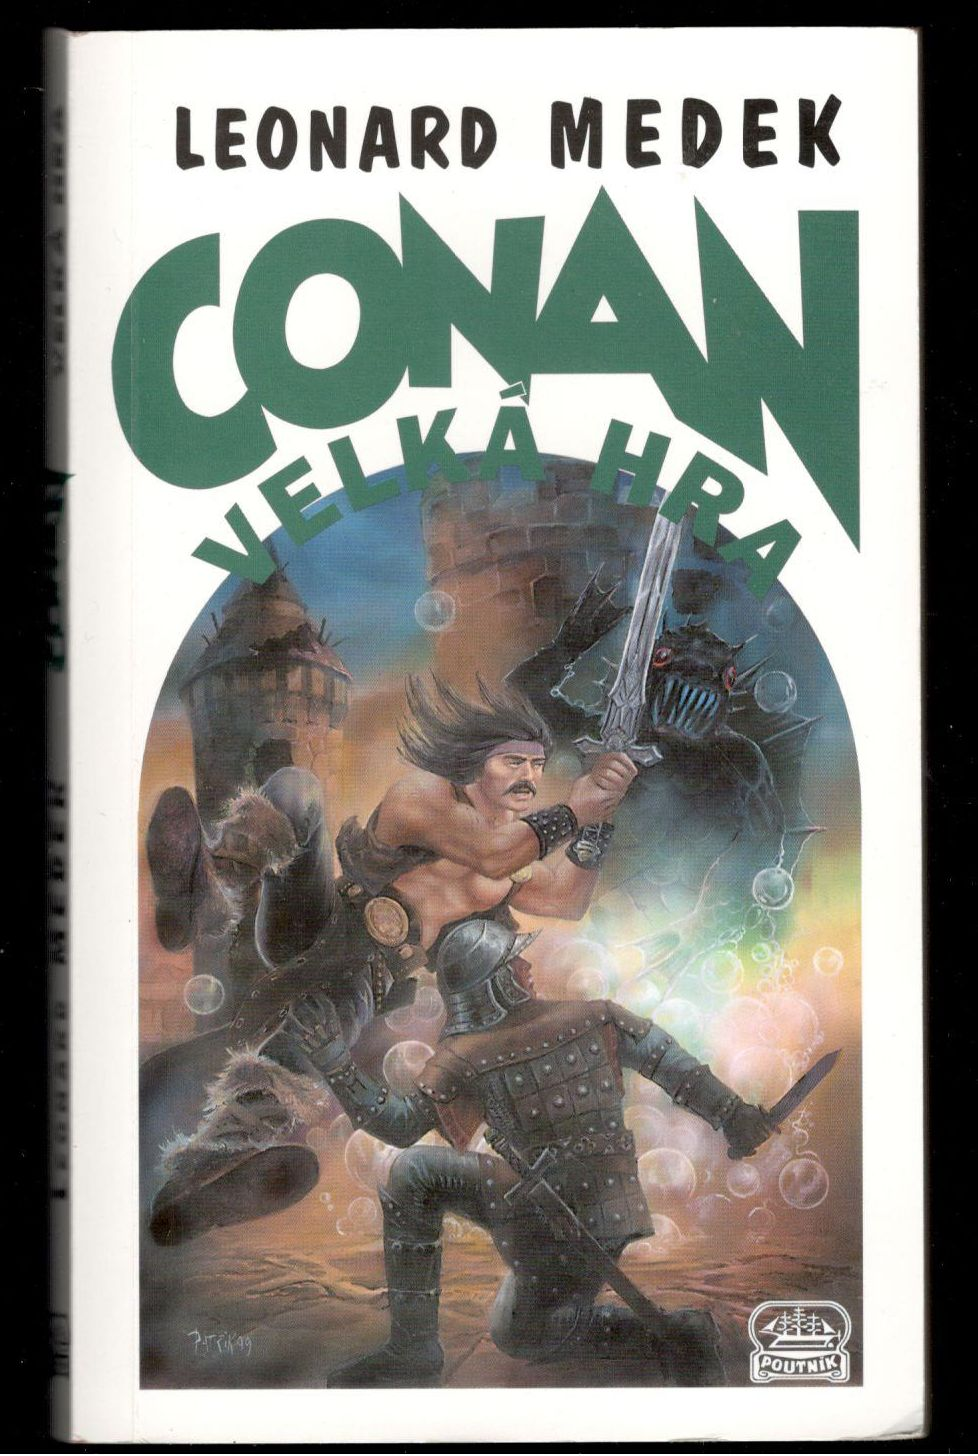 Conan a velká hra - Leonard Medek